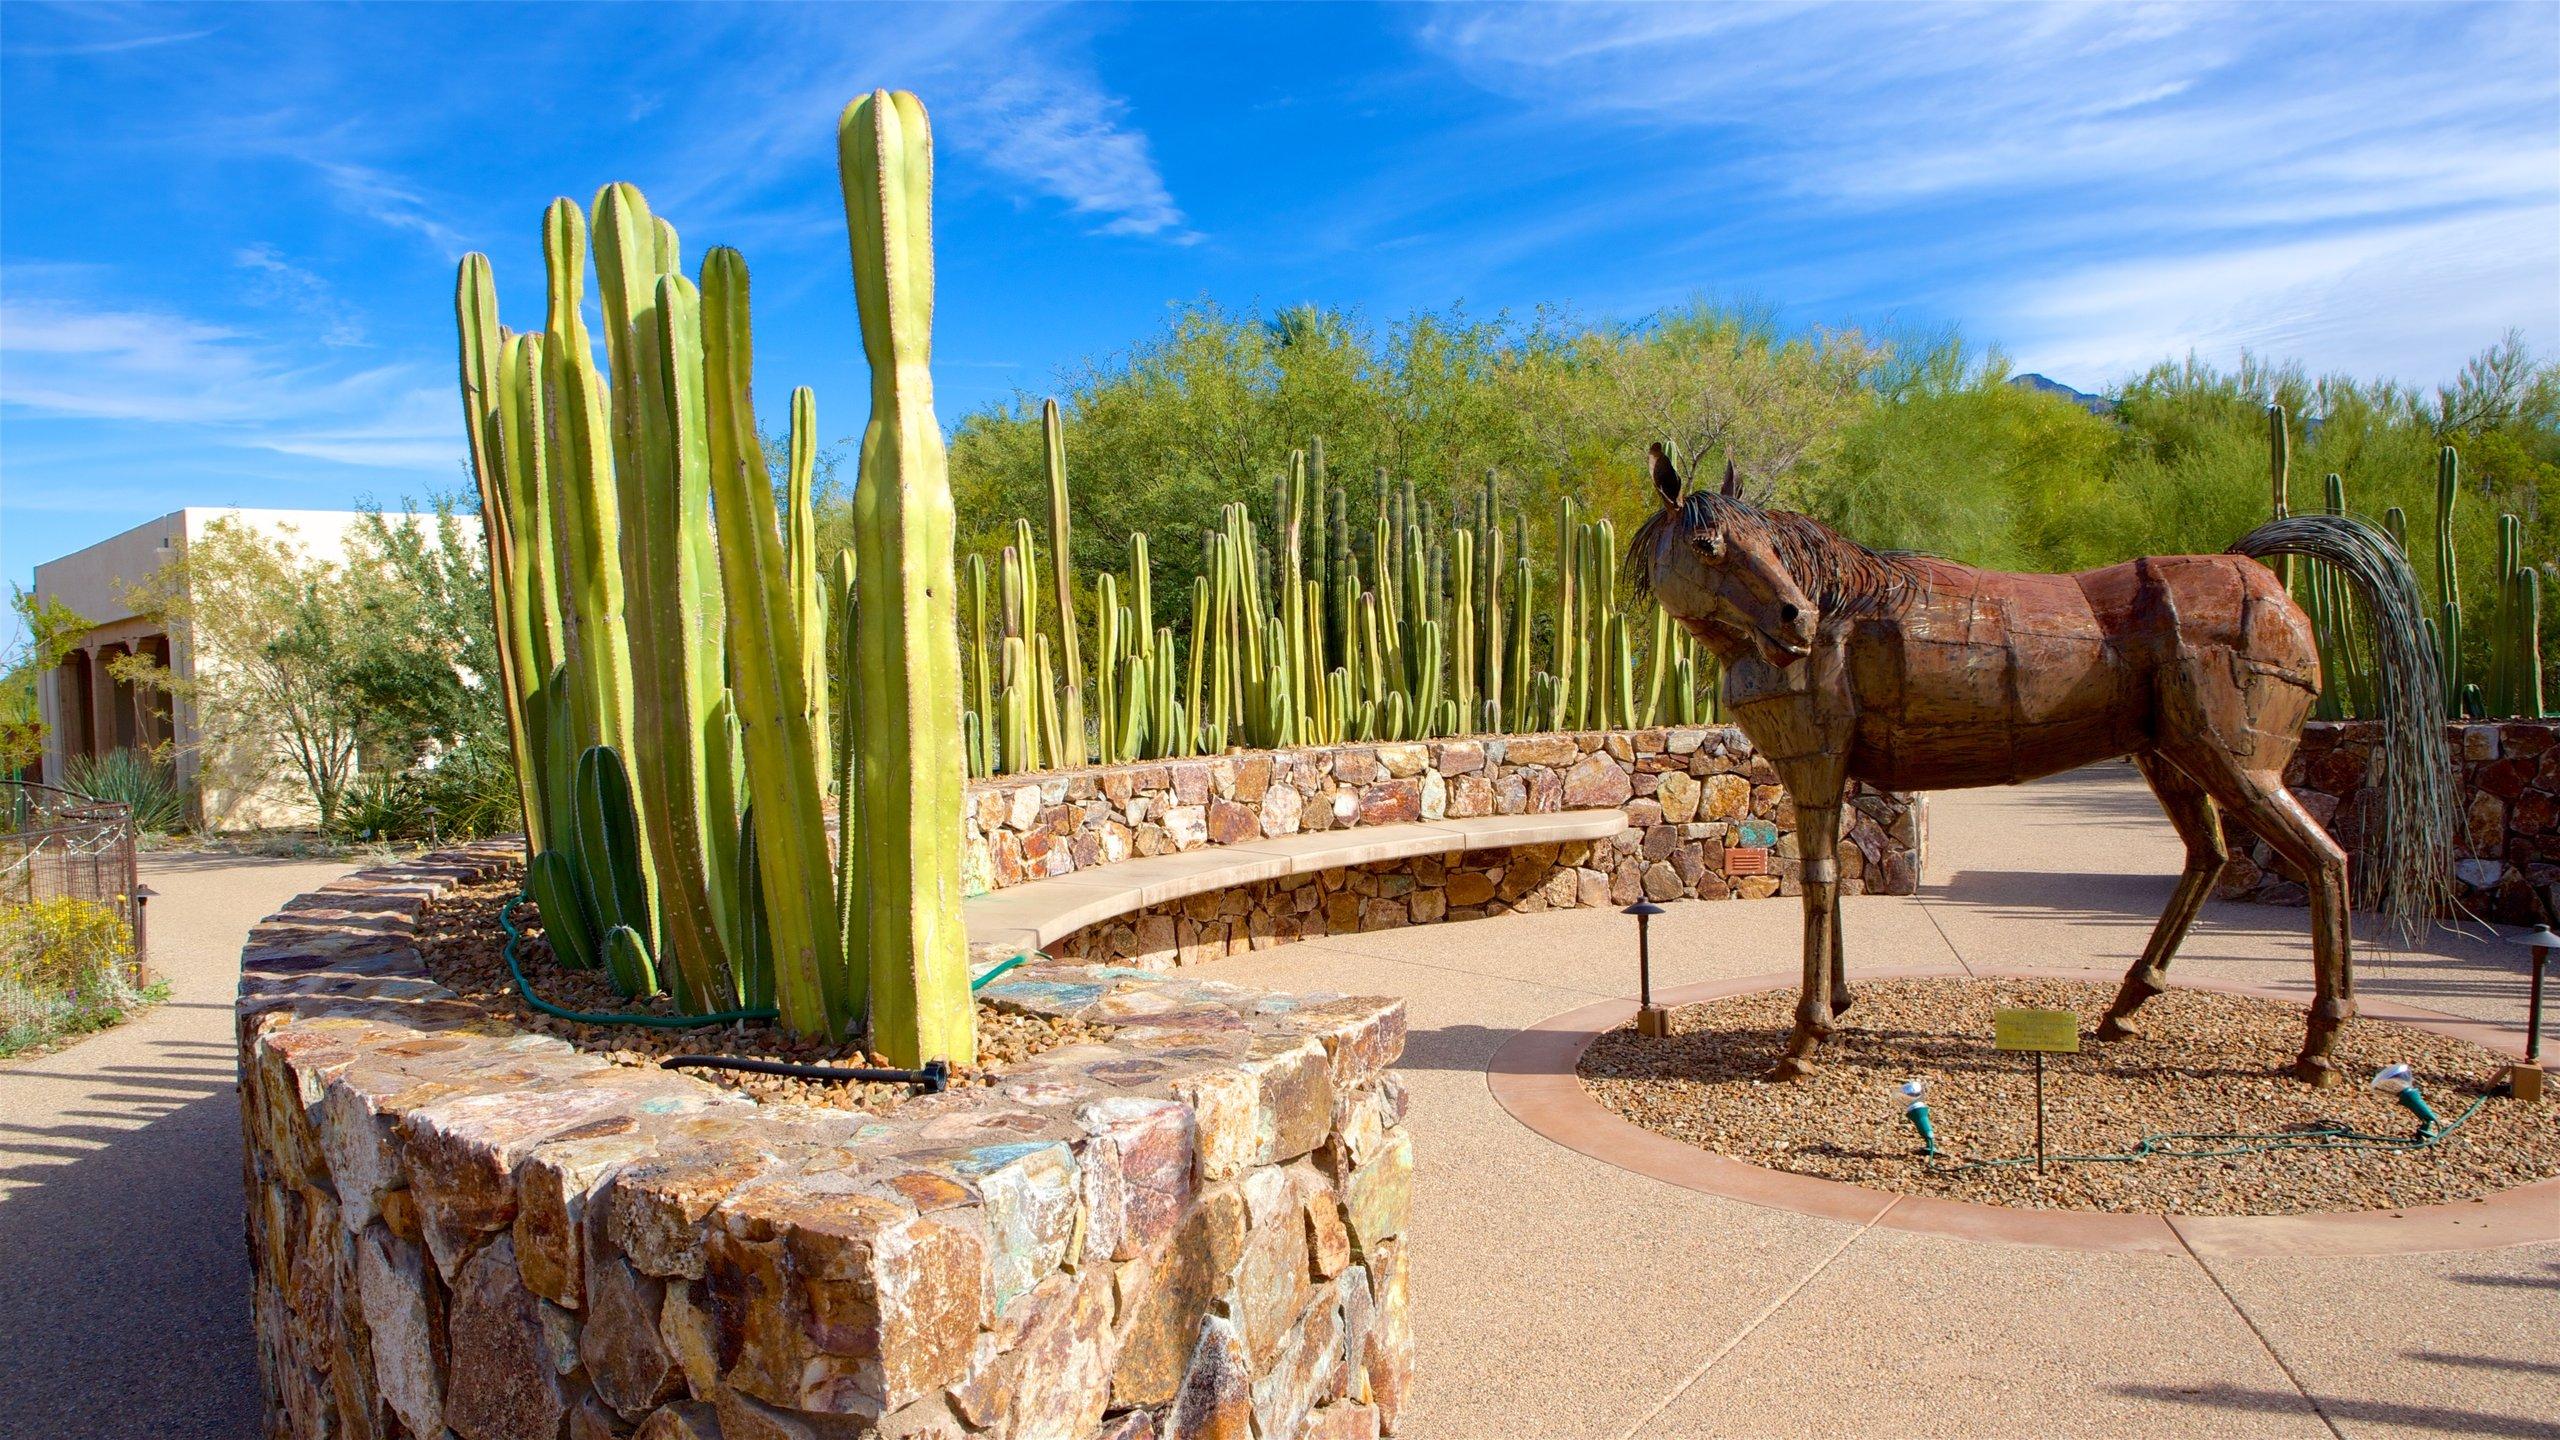 Casas Adobes, Arizona, Verenigde Staten